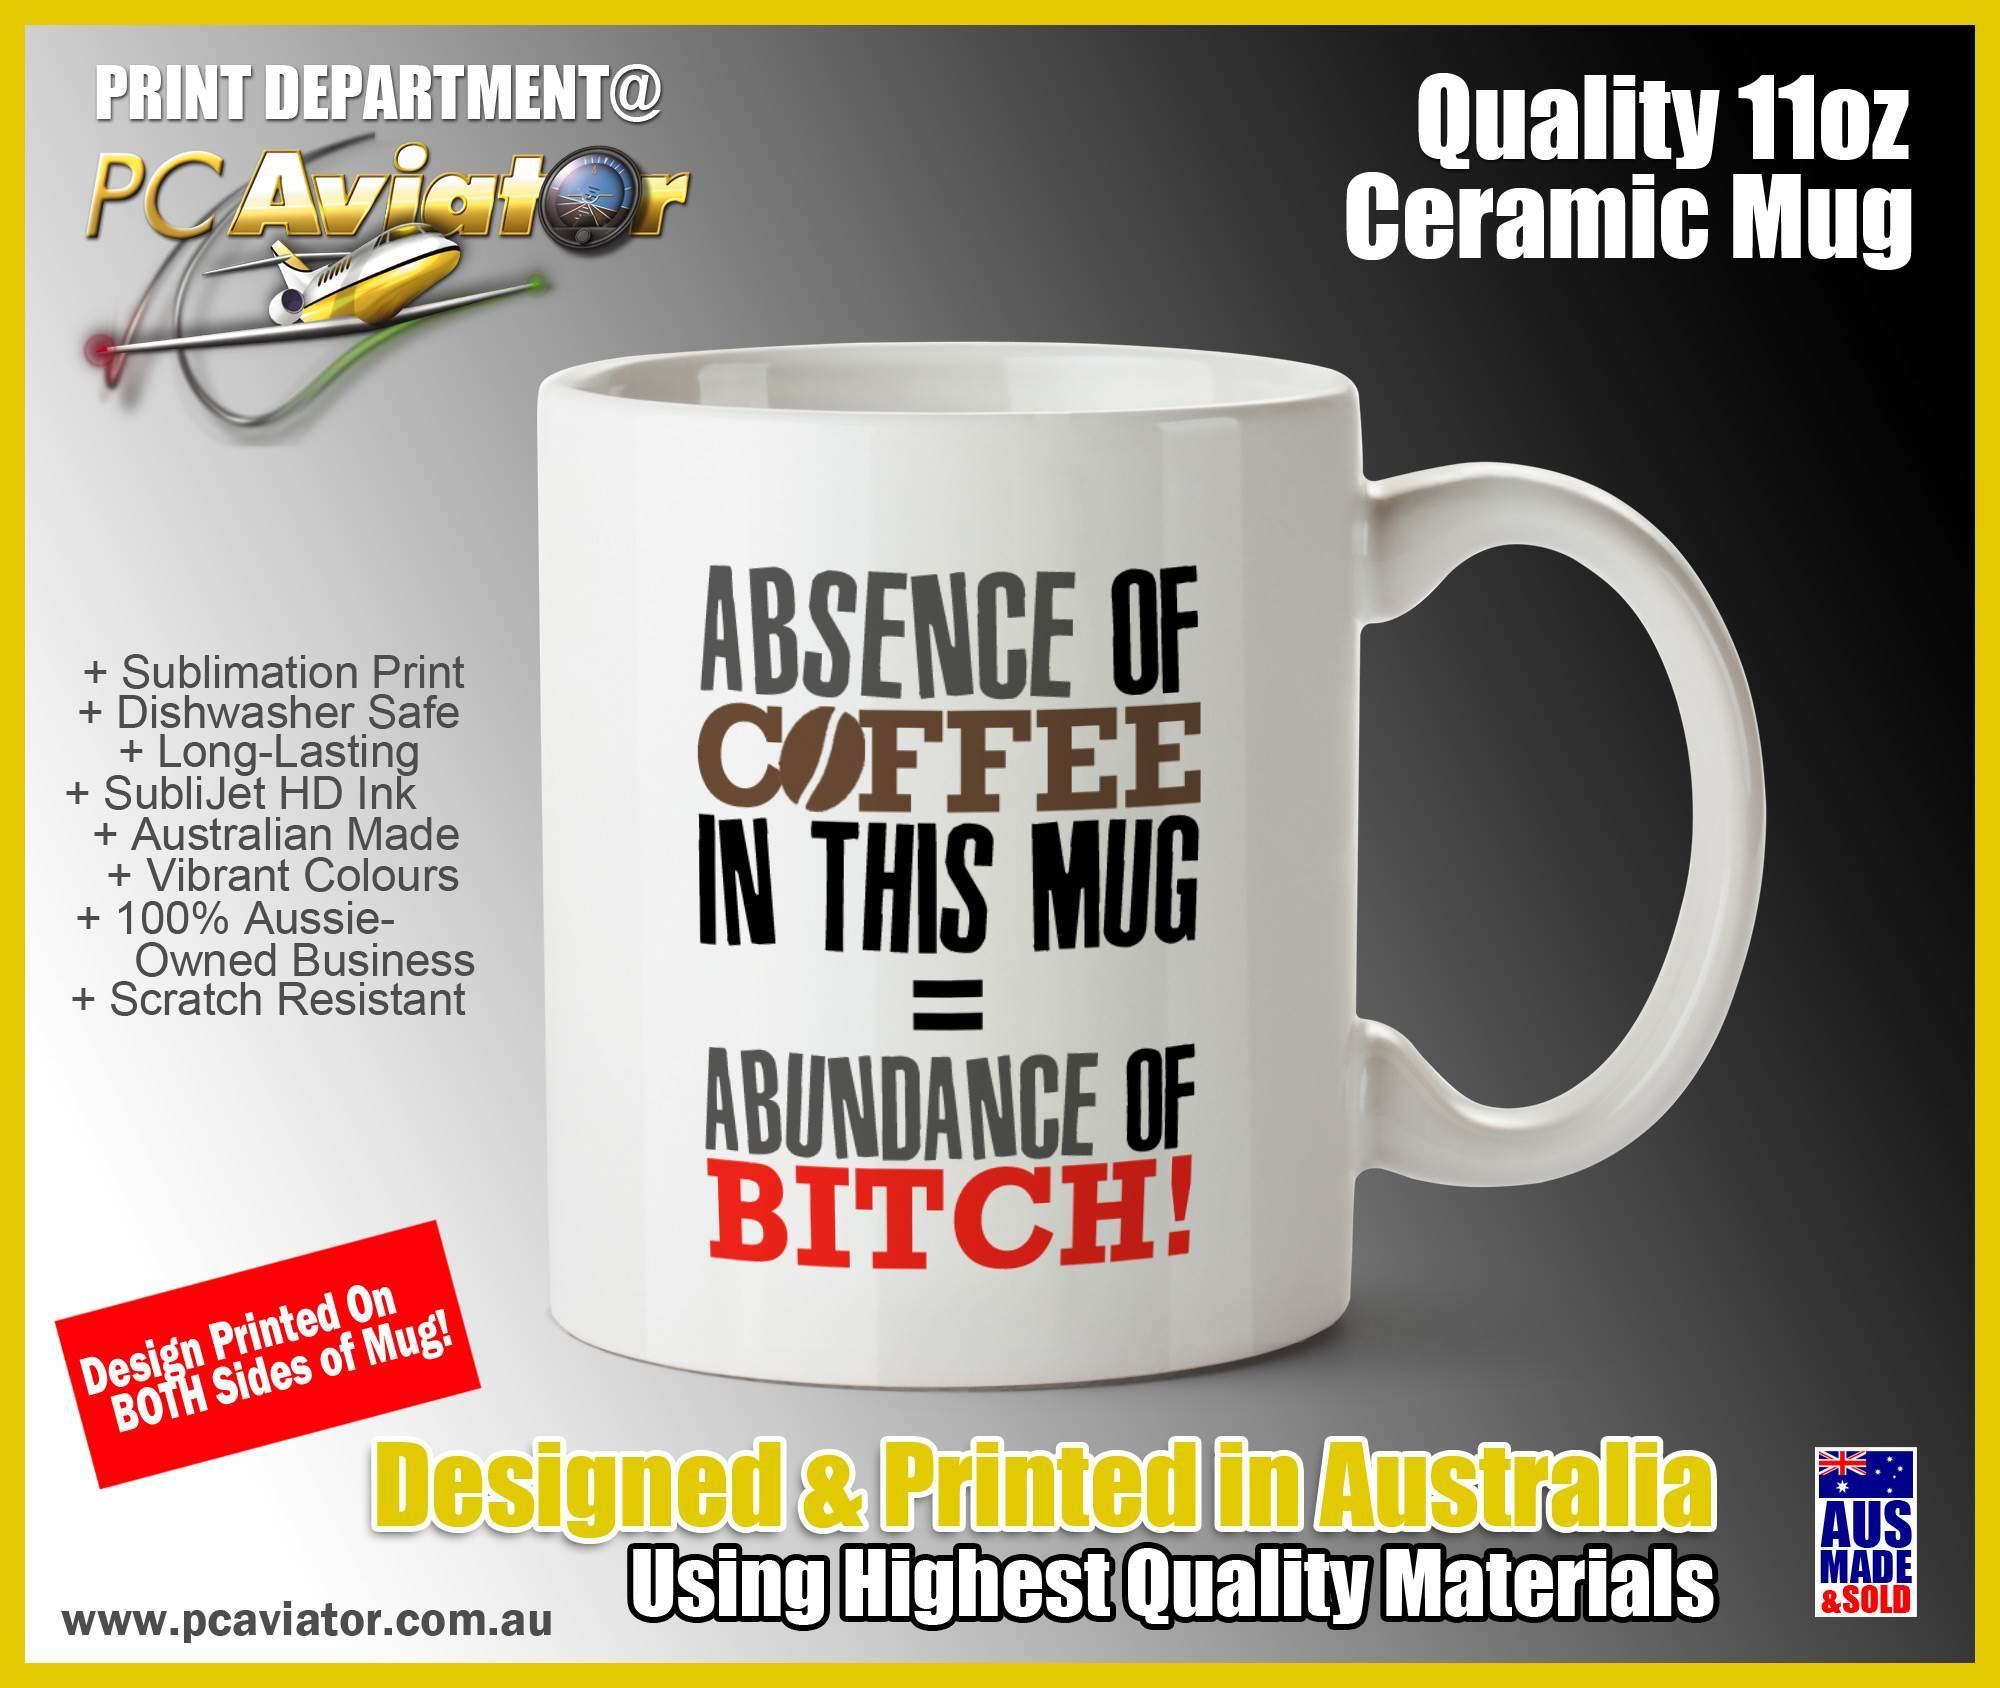 Absence of Coffee = Abundance of Bitch Funny Coffee Mug (Free Shipping)